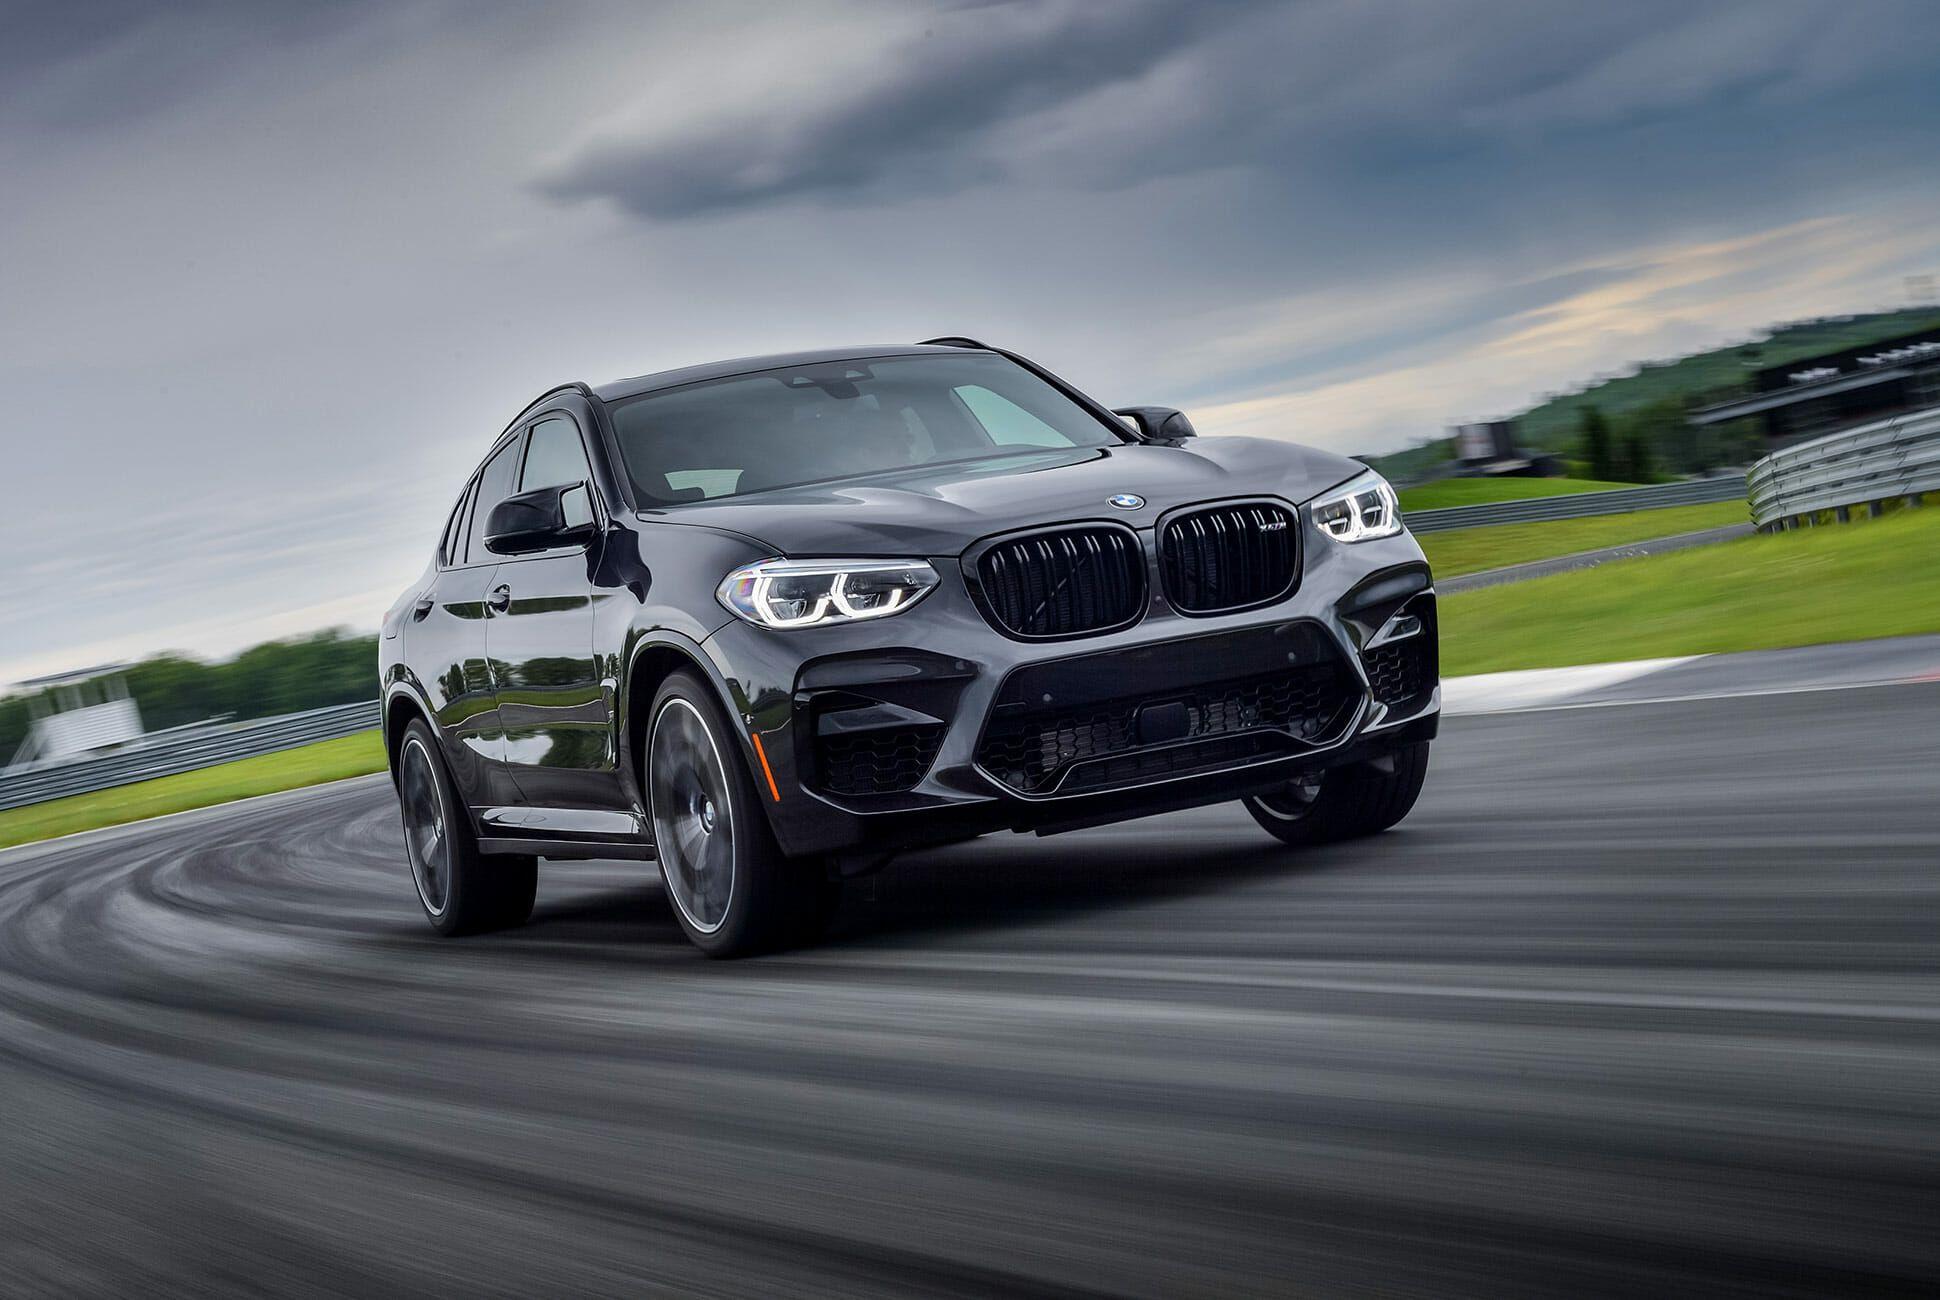 2020-BMW-X3-M-X4-M-Review-gear-patrol-slide-7